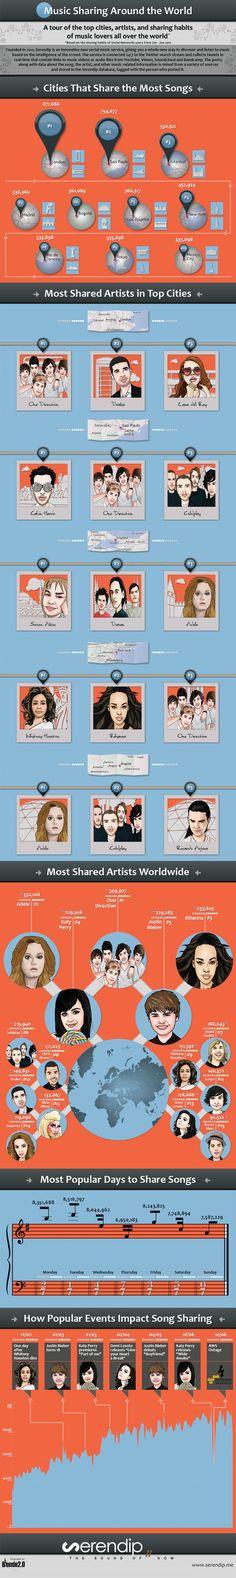 Hábitos de compartir música en el mundo #infografia #infographic #socialmedia